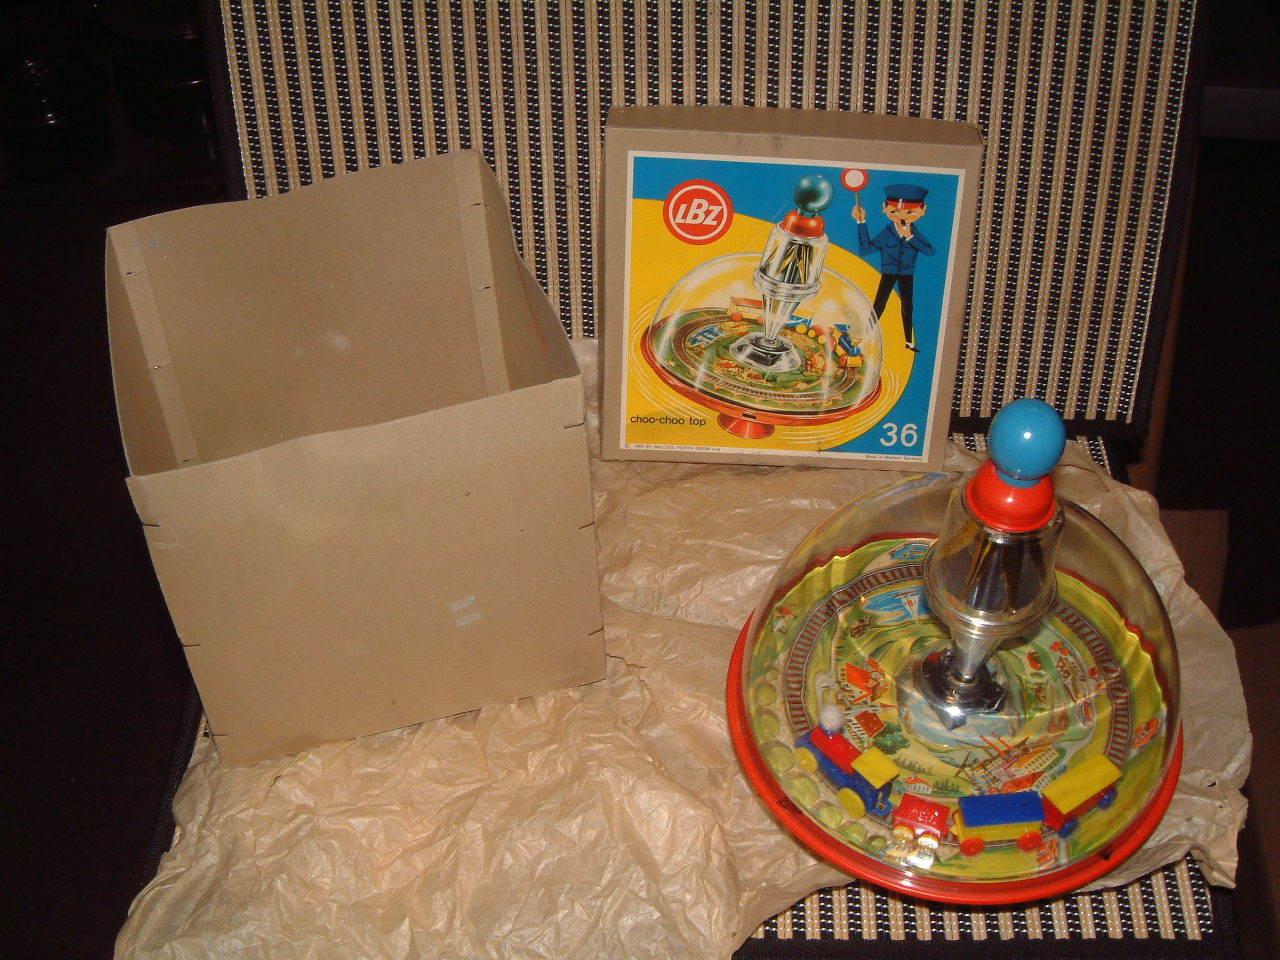 1963 LBZ TIN & PLASTIC SPINNING  CHOO-CHOO TOP  WESTERN GERMANY W/ORIGINAL BOX